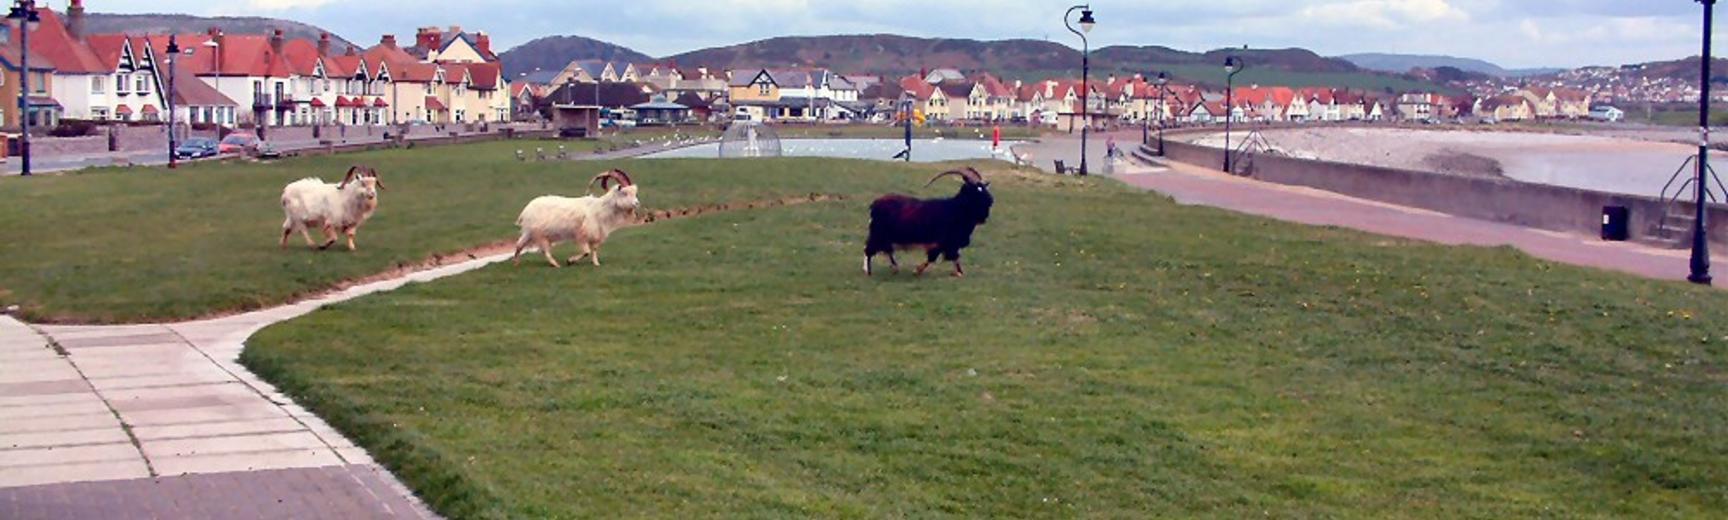 Photo of Goats roaming free in Llandudno